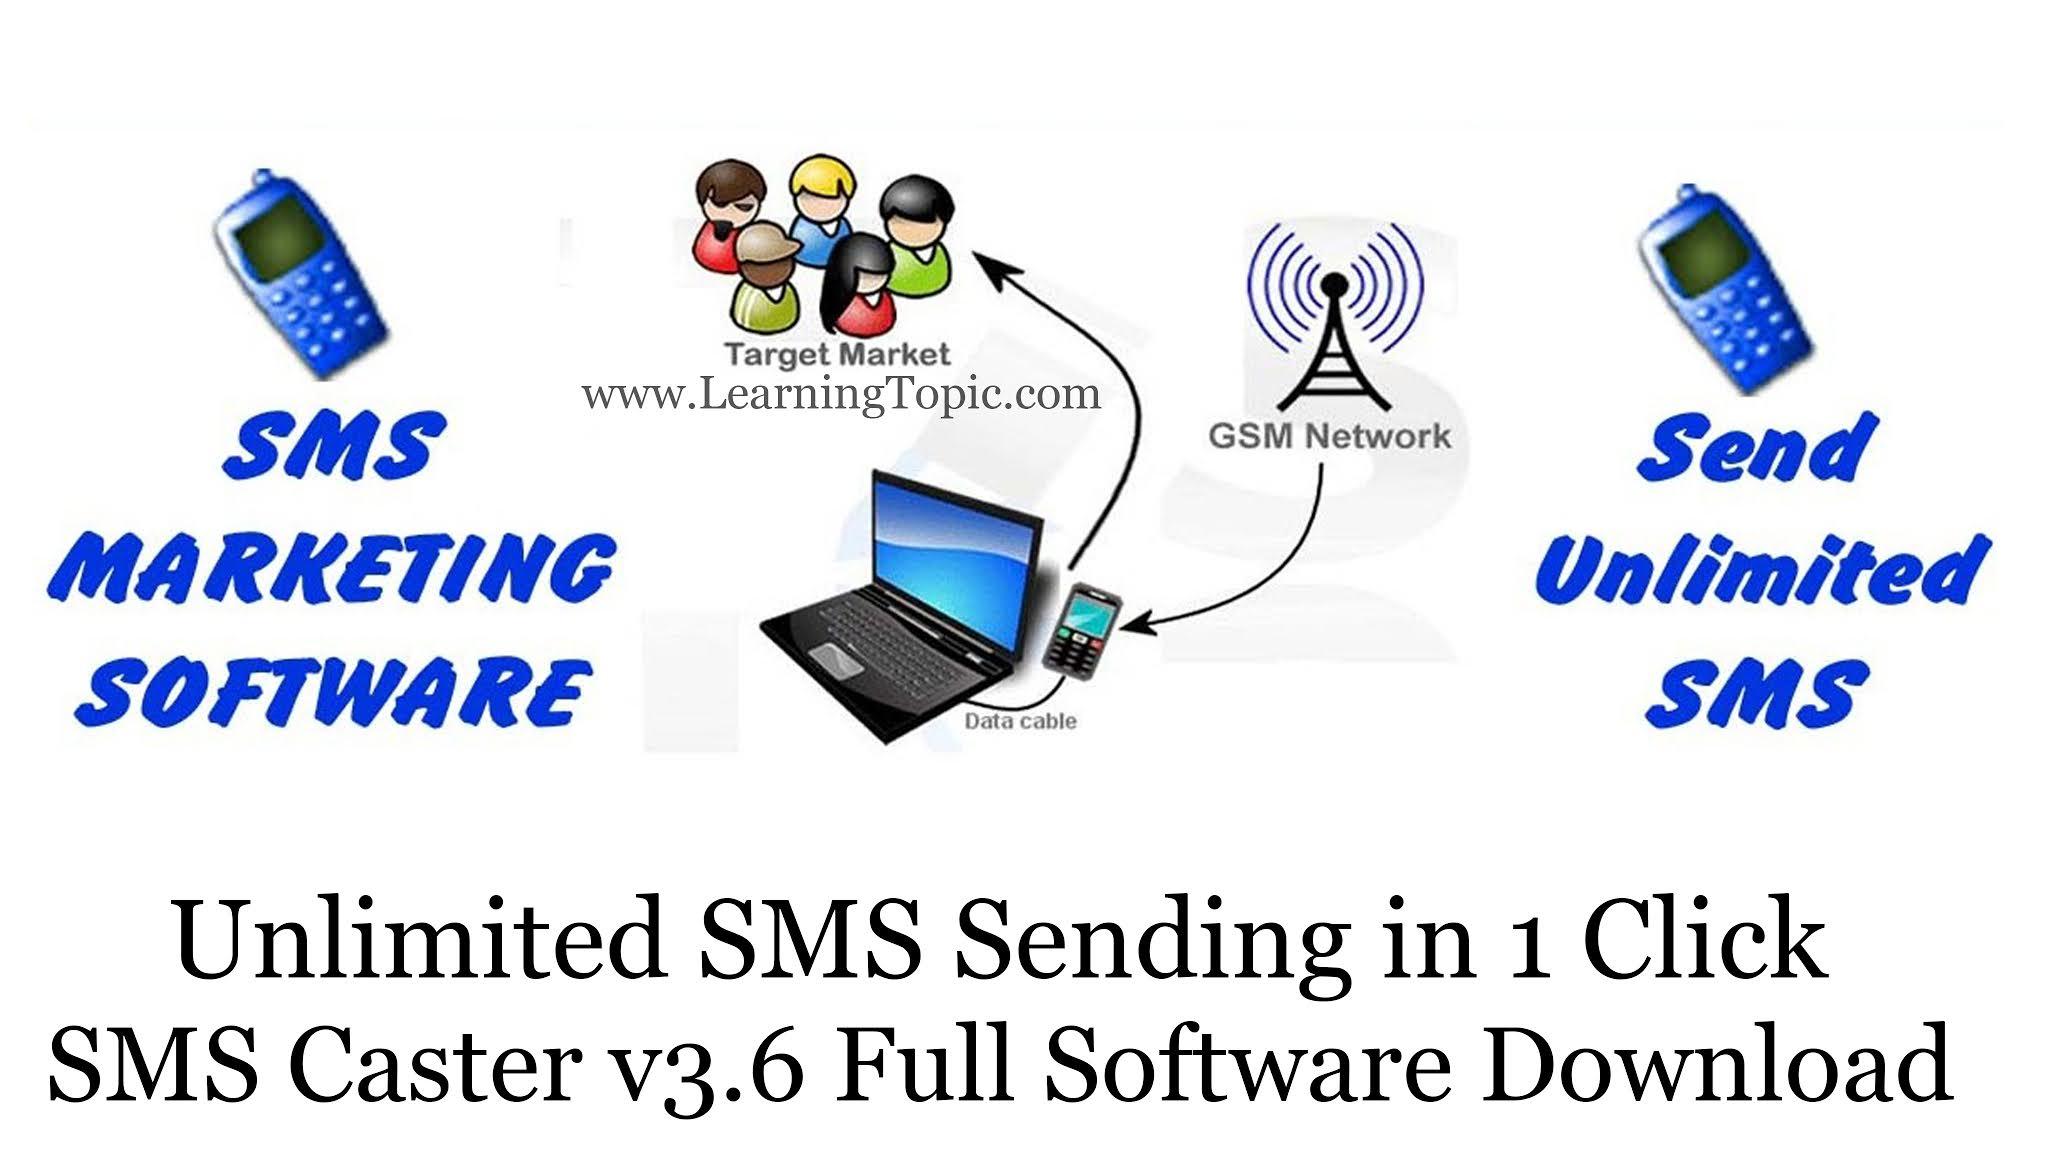 SMS Caster v3.6 Full Software Download || SMS Marketing Software || Unlimited SMS Sending in 1 Click